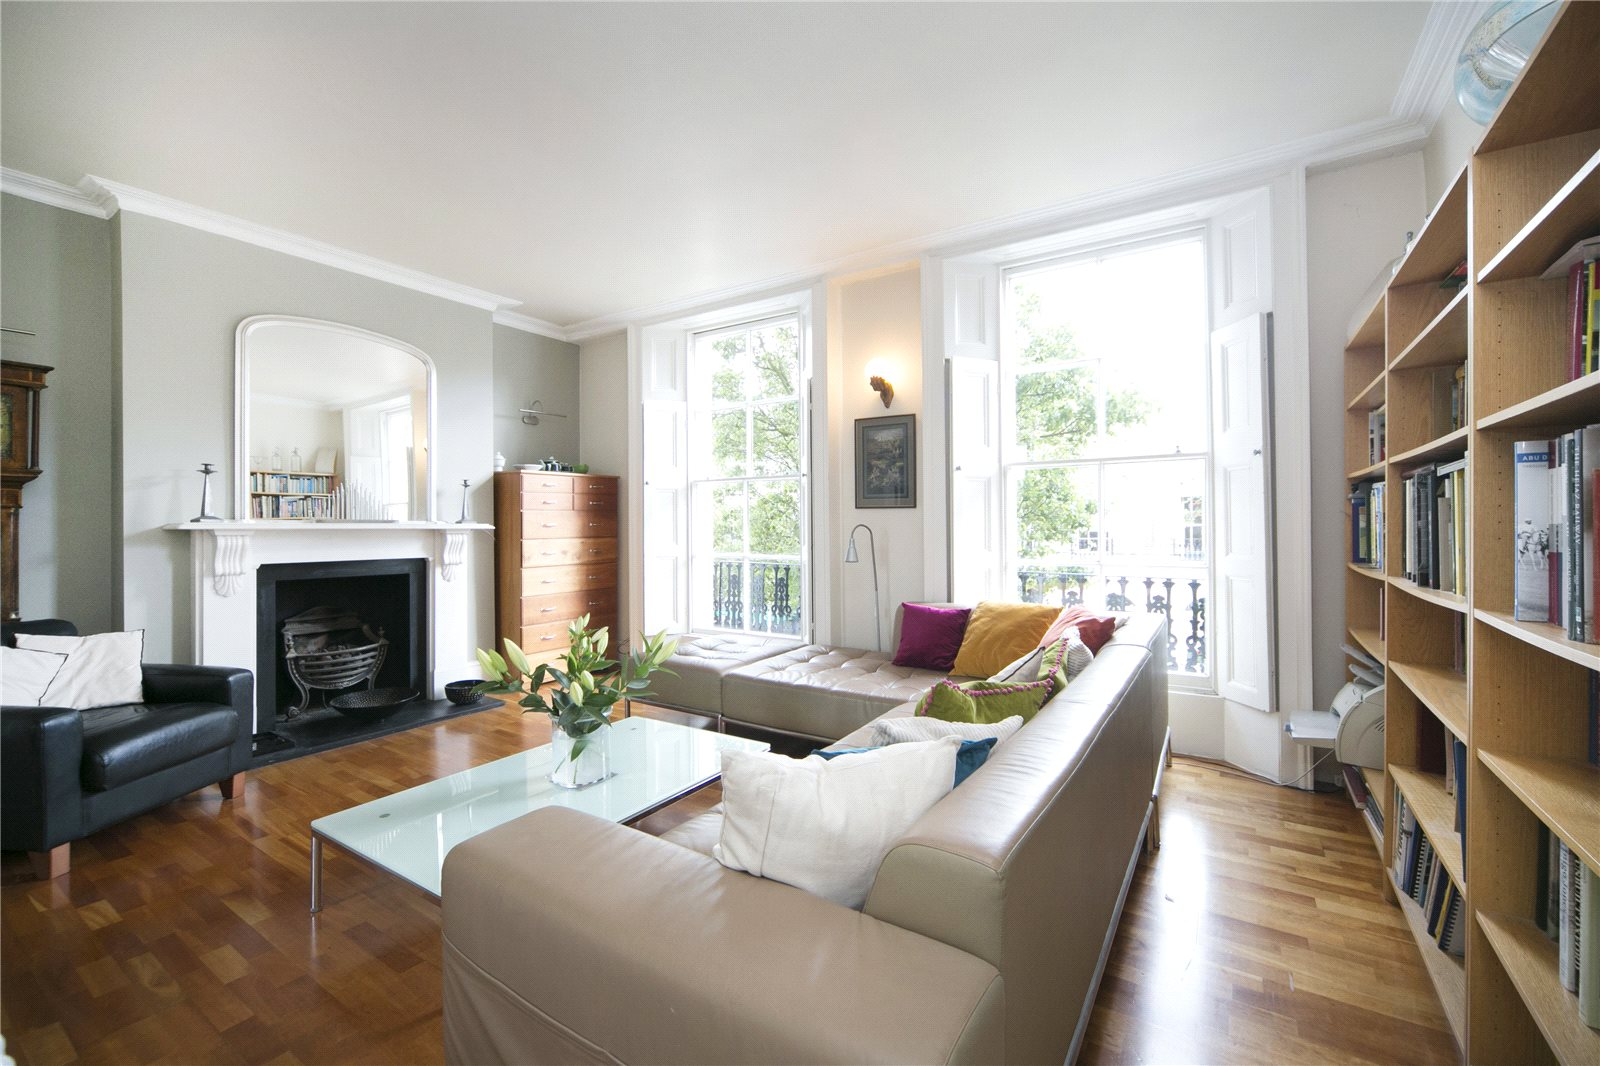 5 Bedrooms Terraced House for sale in Gerrard Road, Islington, N1